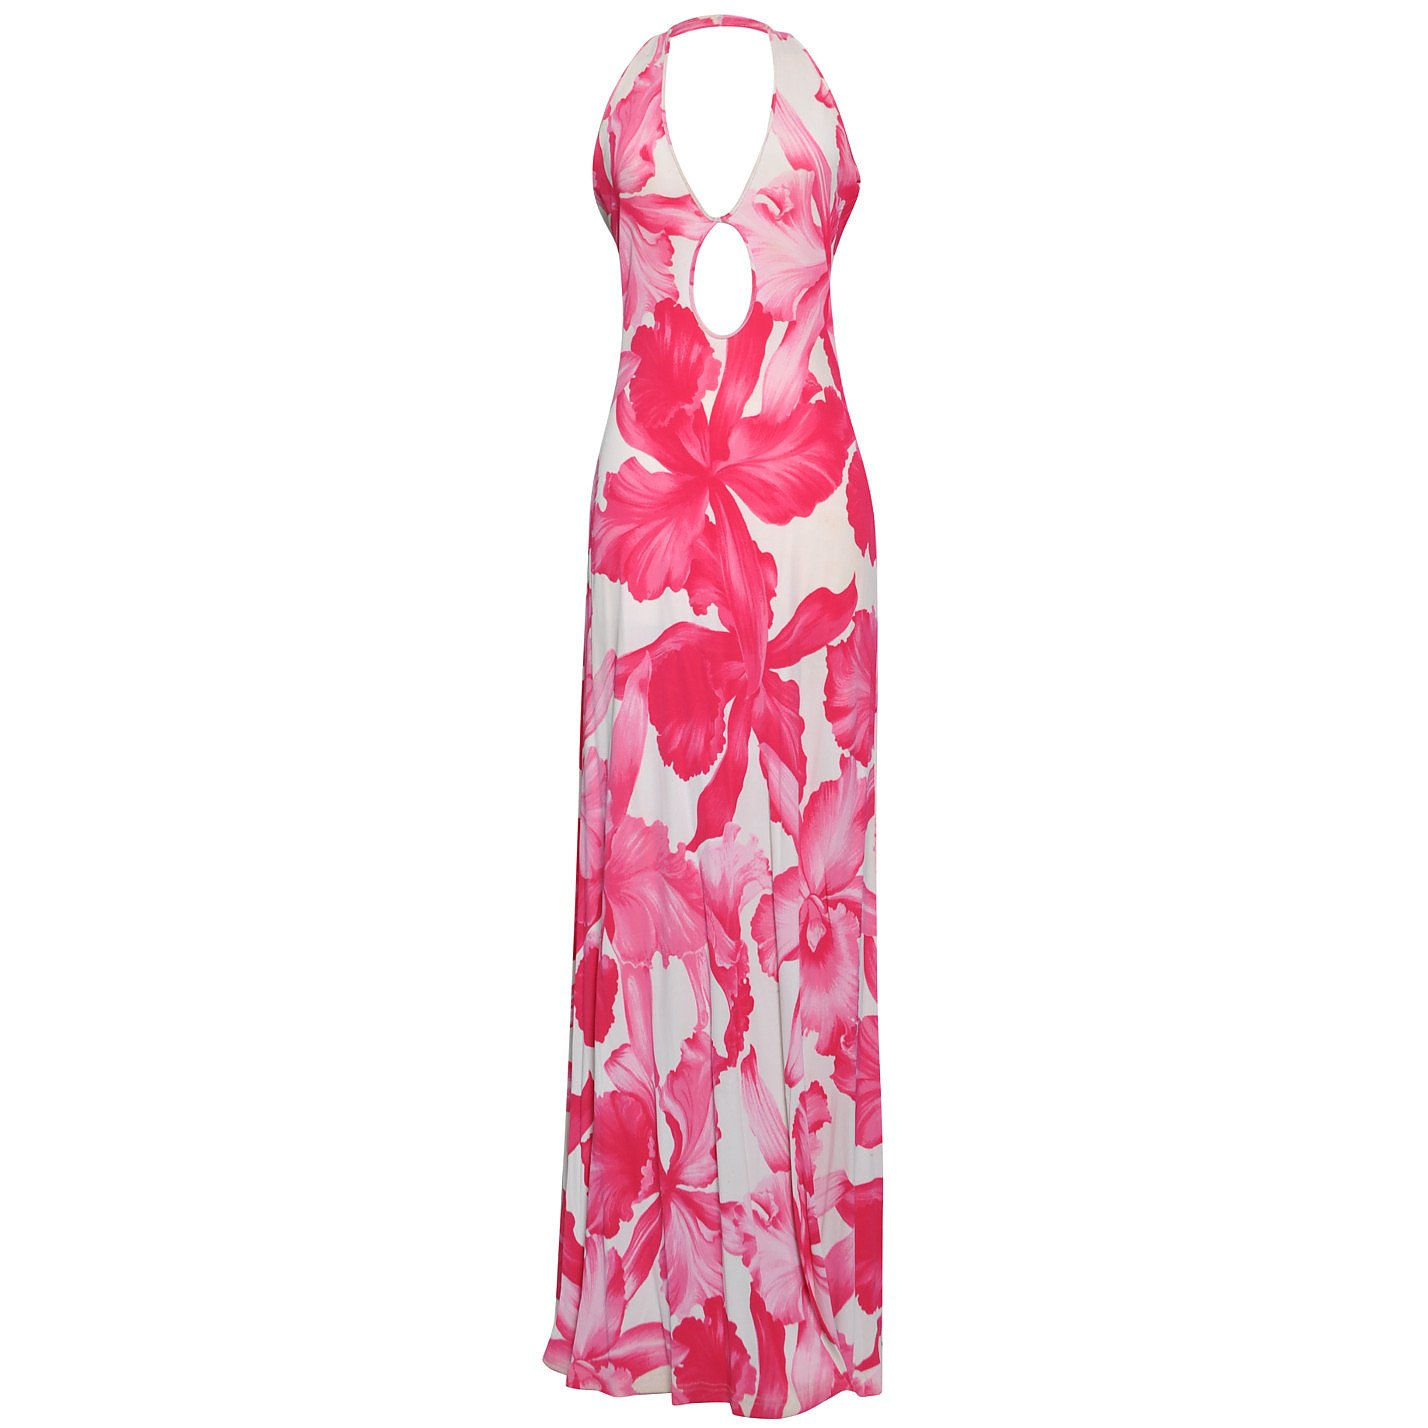 CÉLINE Floral-Print Halterneck Dress